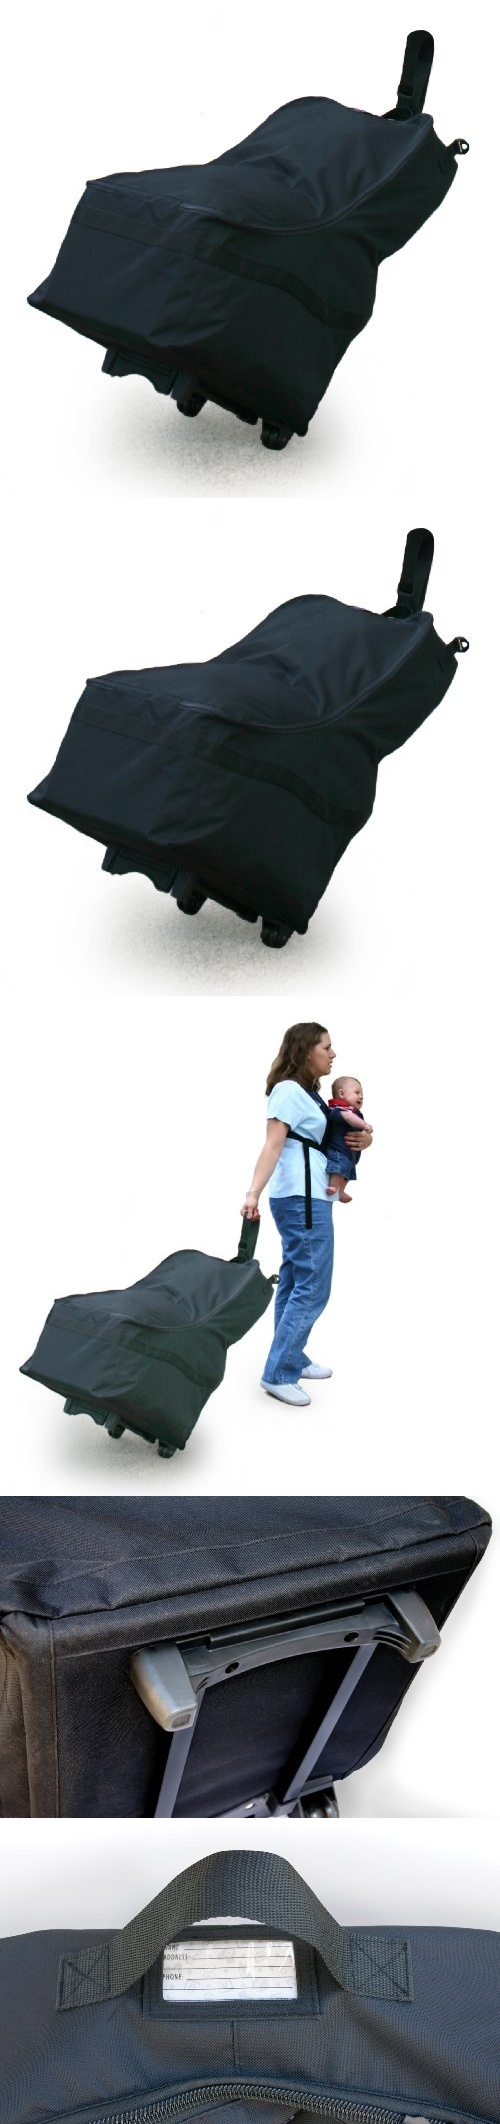 JL Childress Wheelie Car Seat Travel Bag Black